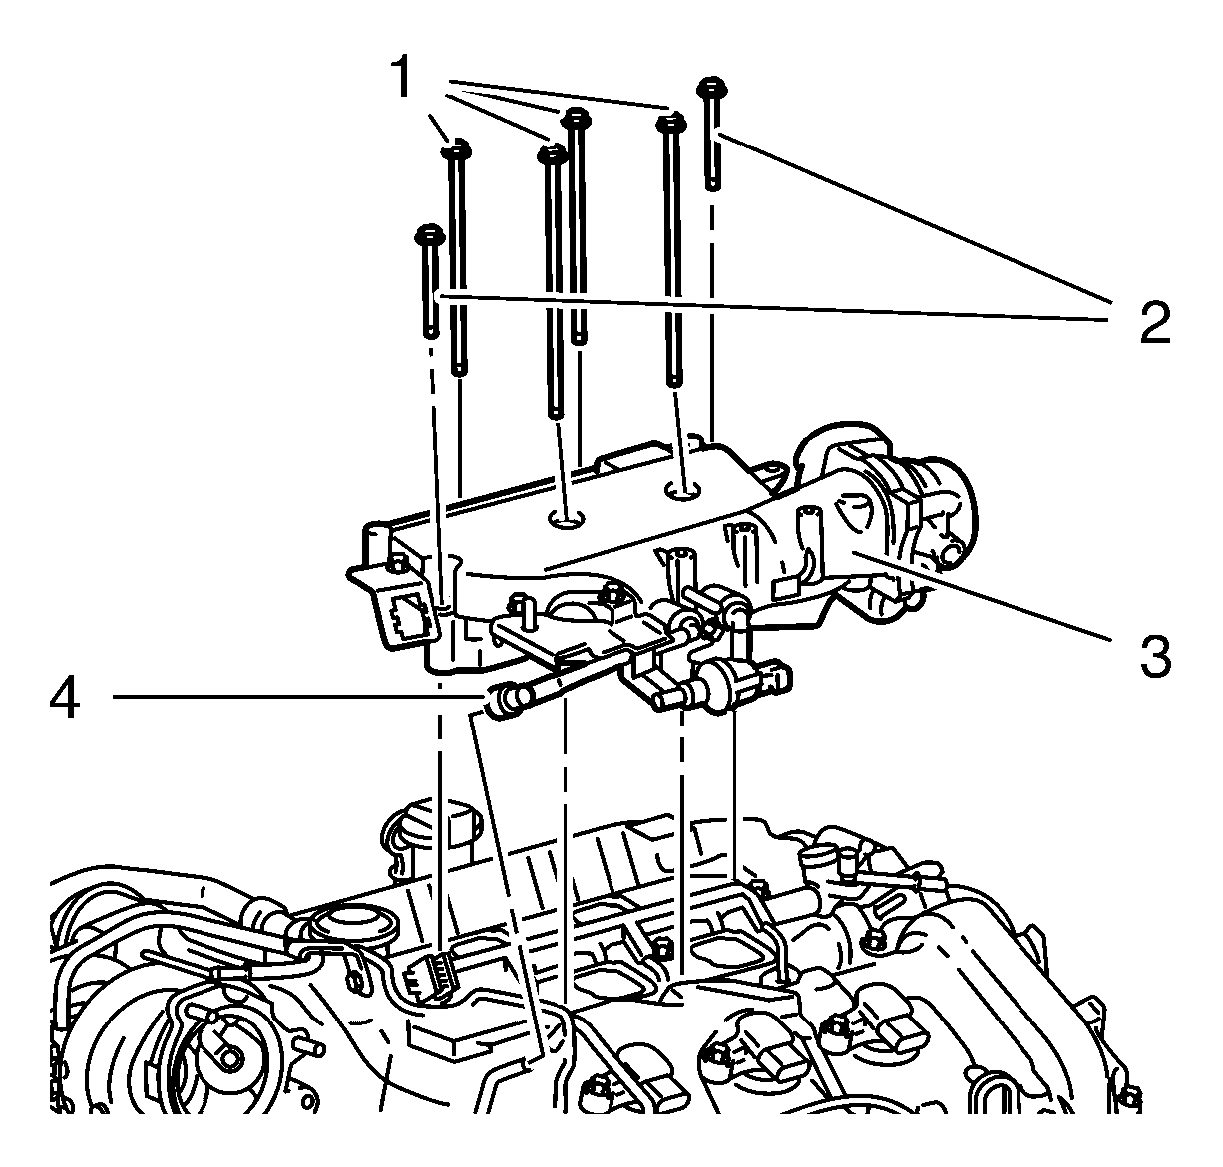 [ZR_2768] Cadillac Srx 2010 Engine Diagram Download Diagram